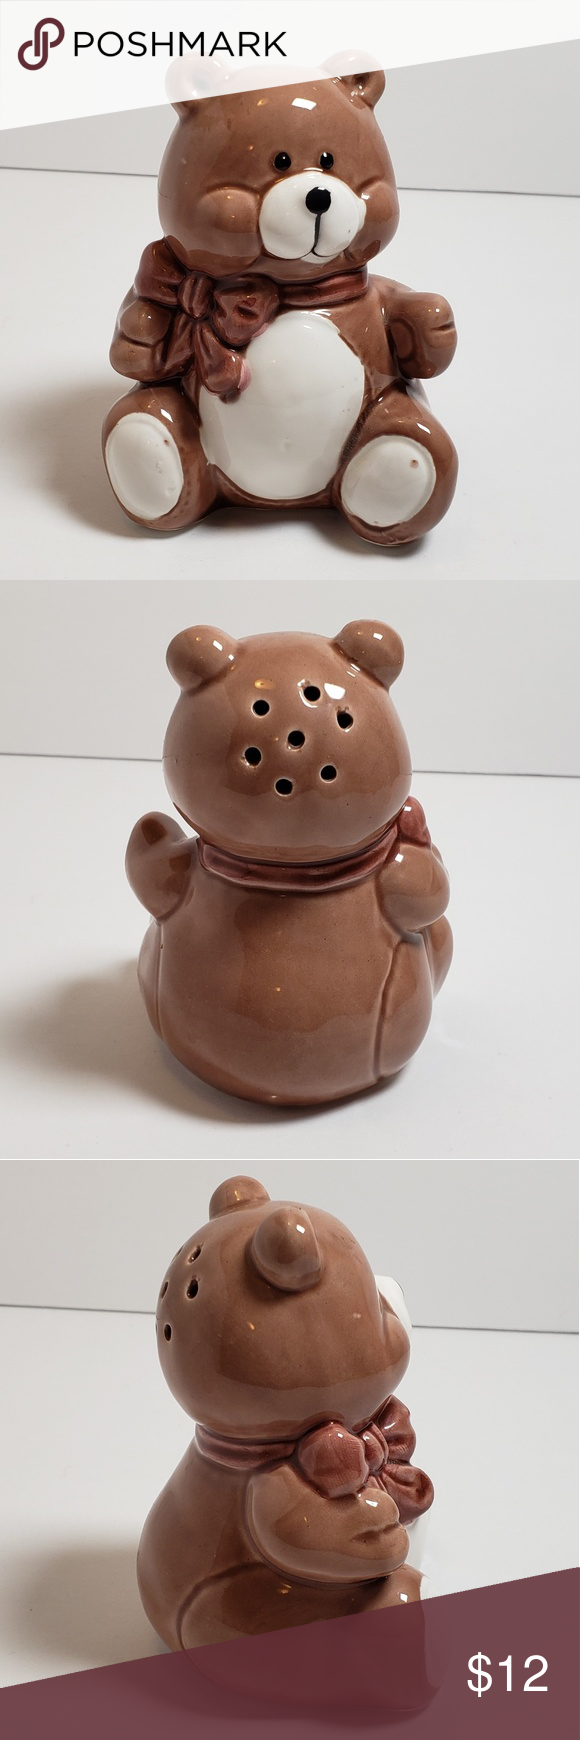 Vintage 80s Teddy Bear Shaker